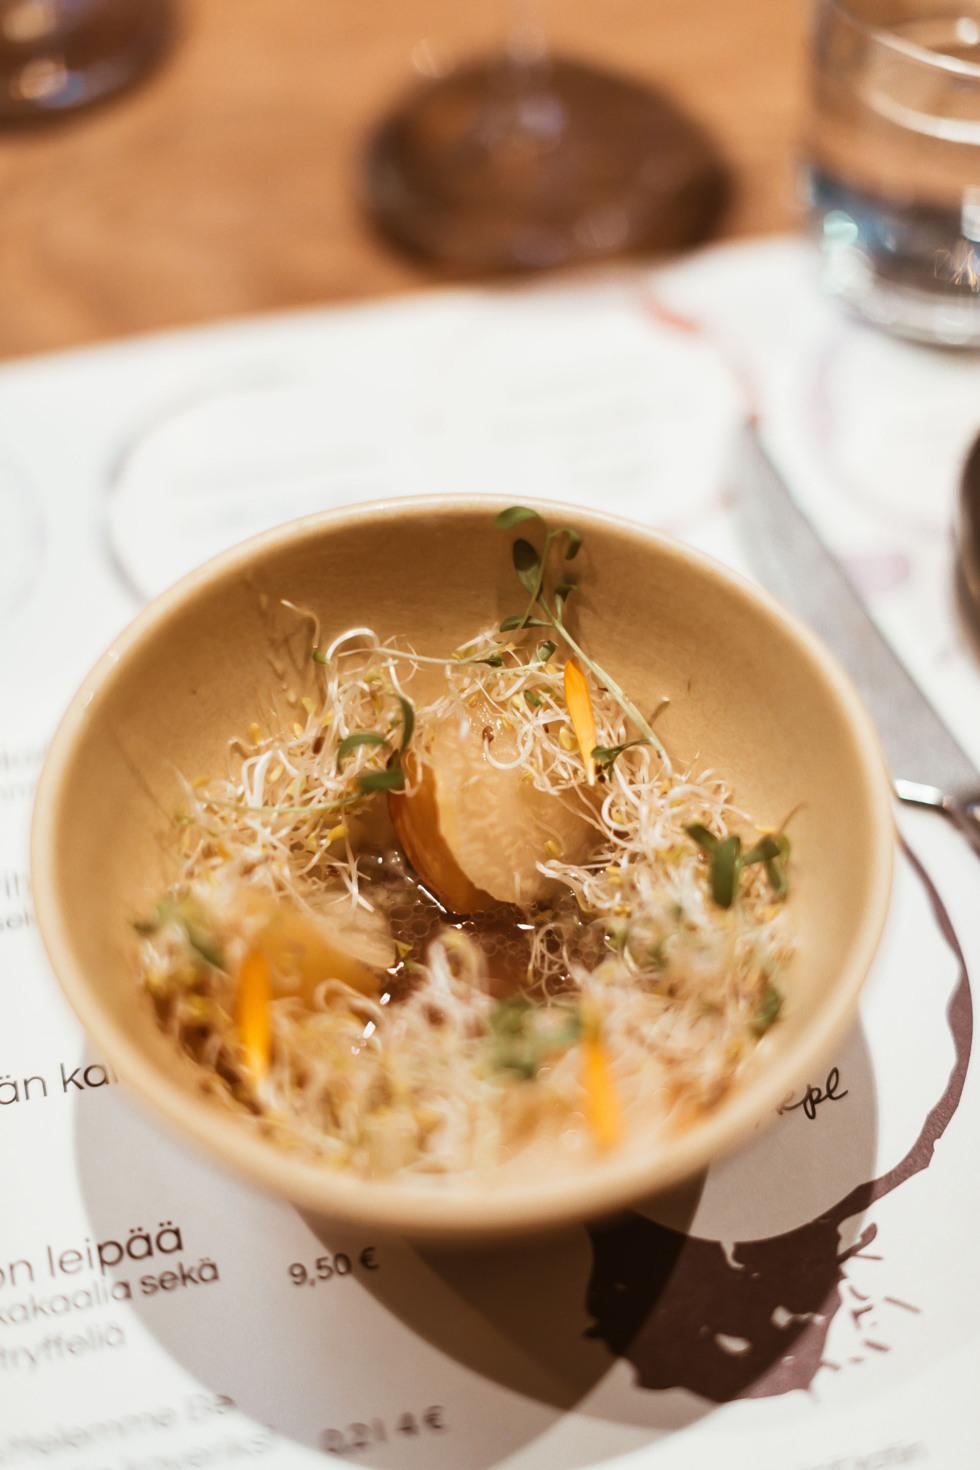 sara-che-finnair-for-foodies-helsinki-resturaunt-fine-dining-nude-starter